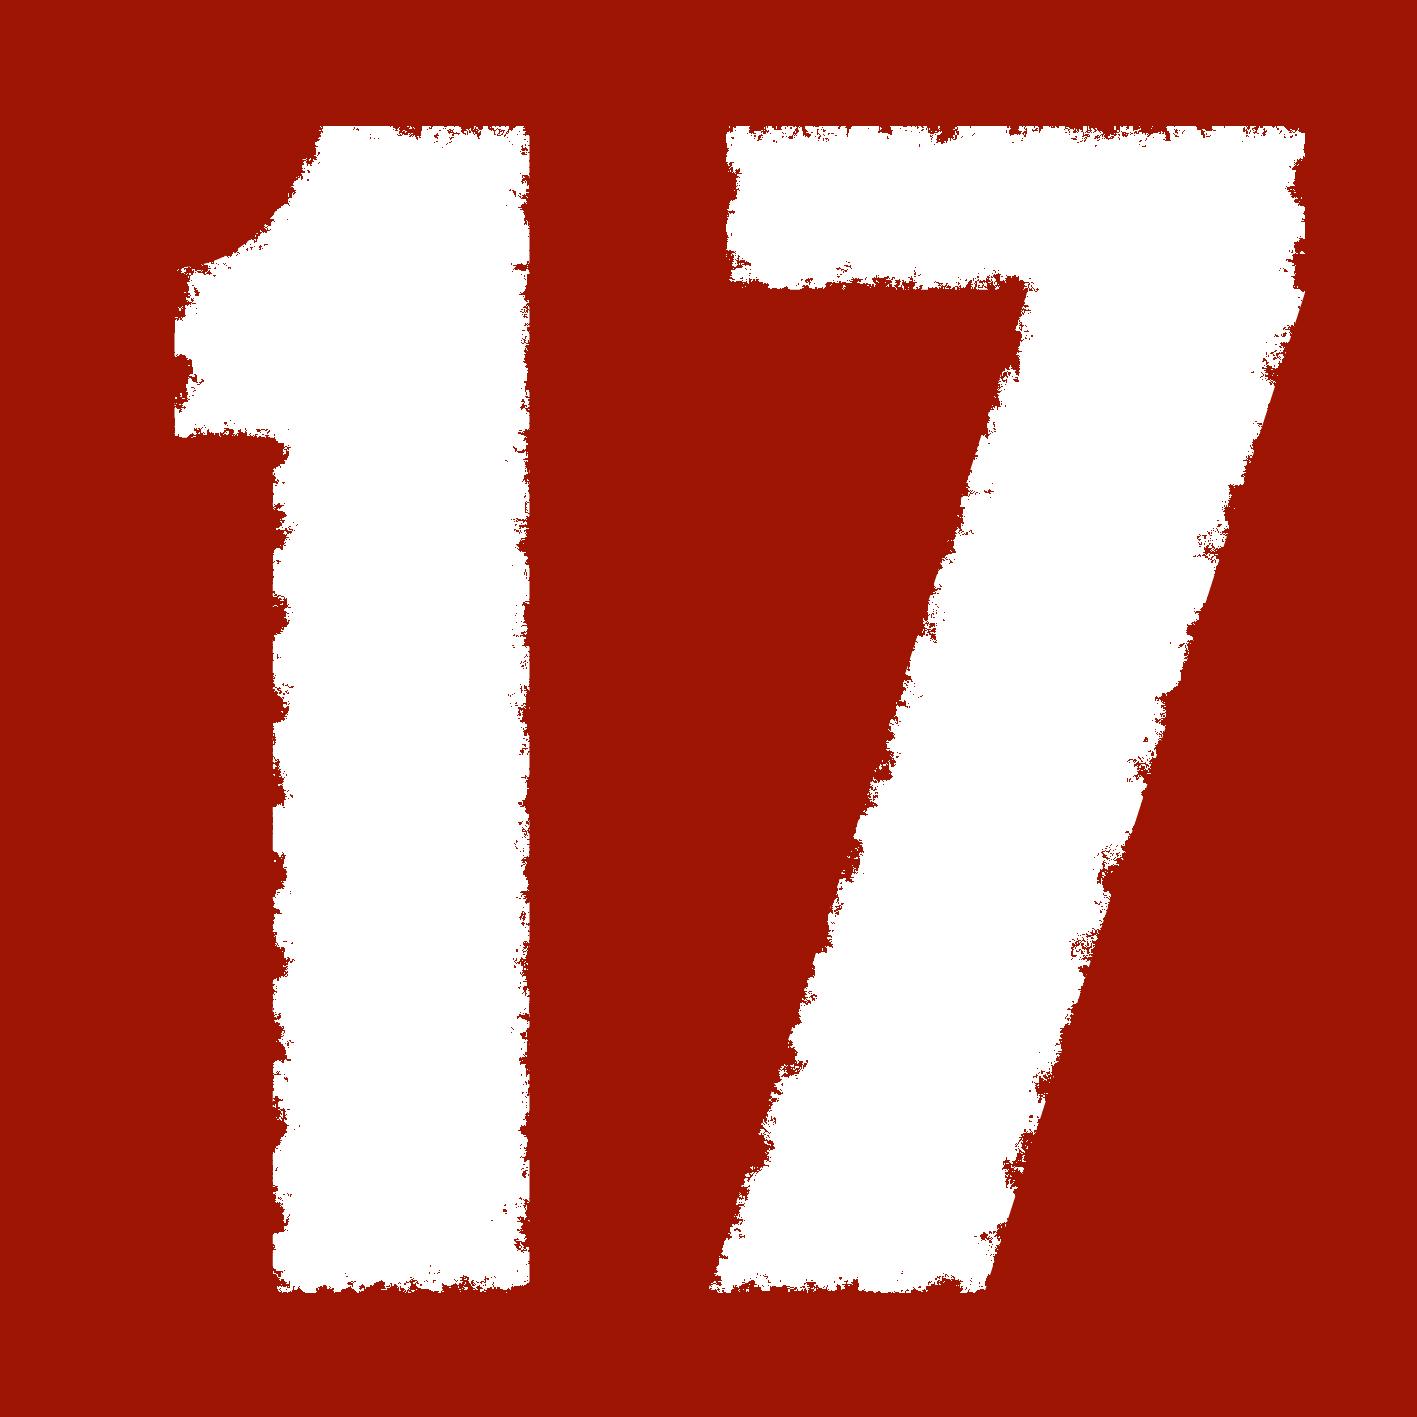 Да броим с картинки 17